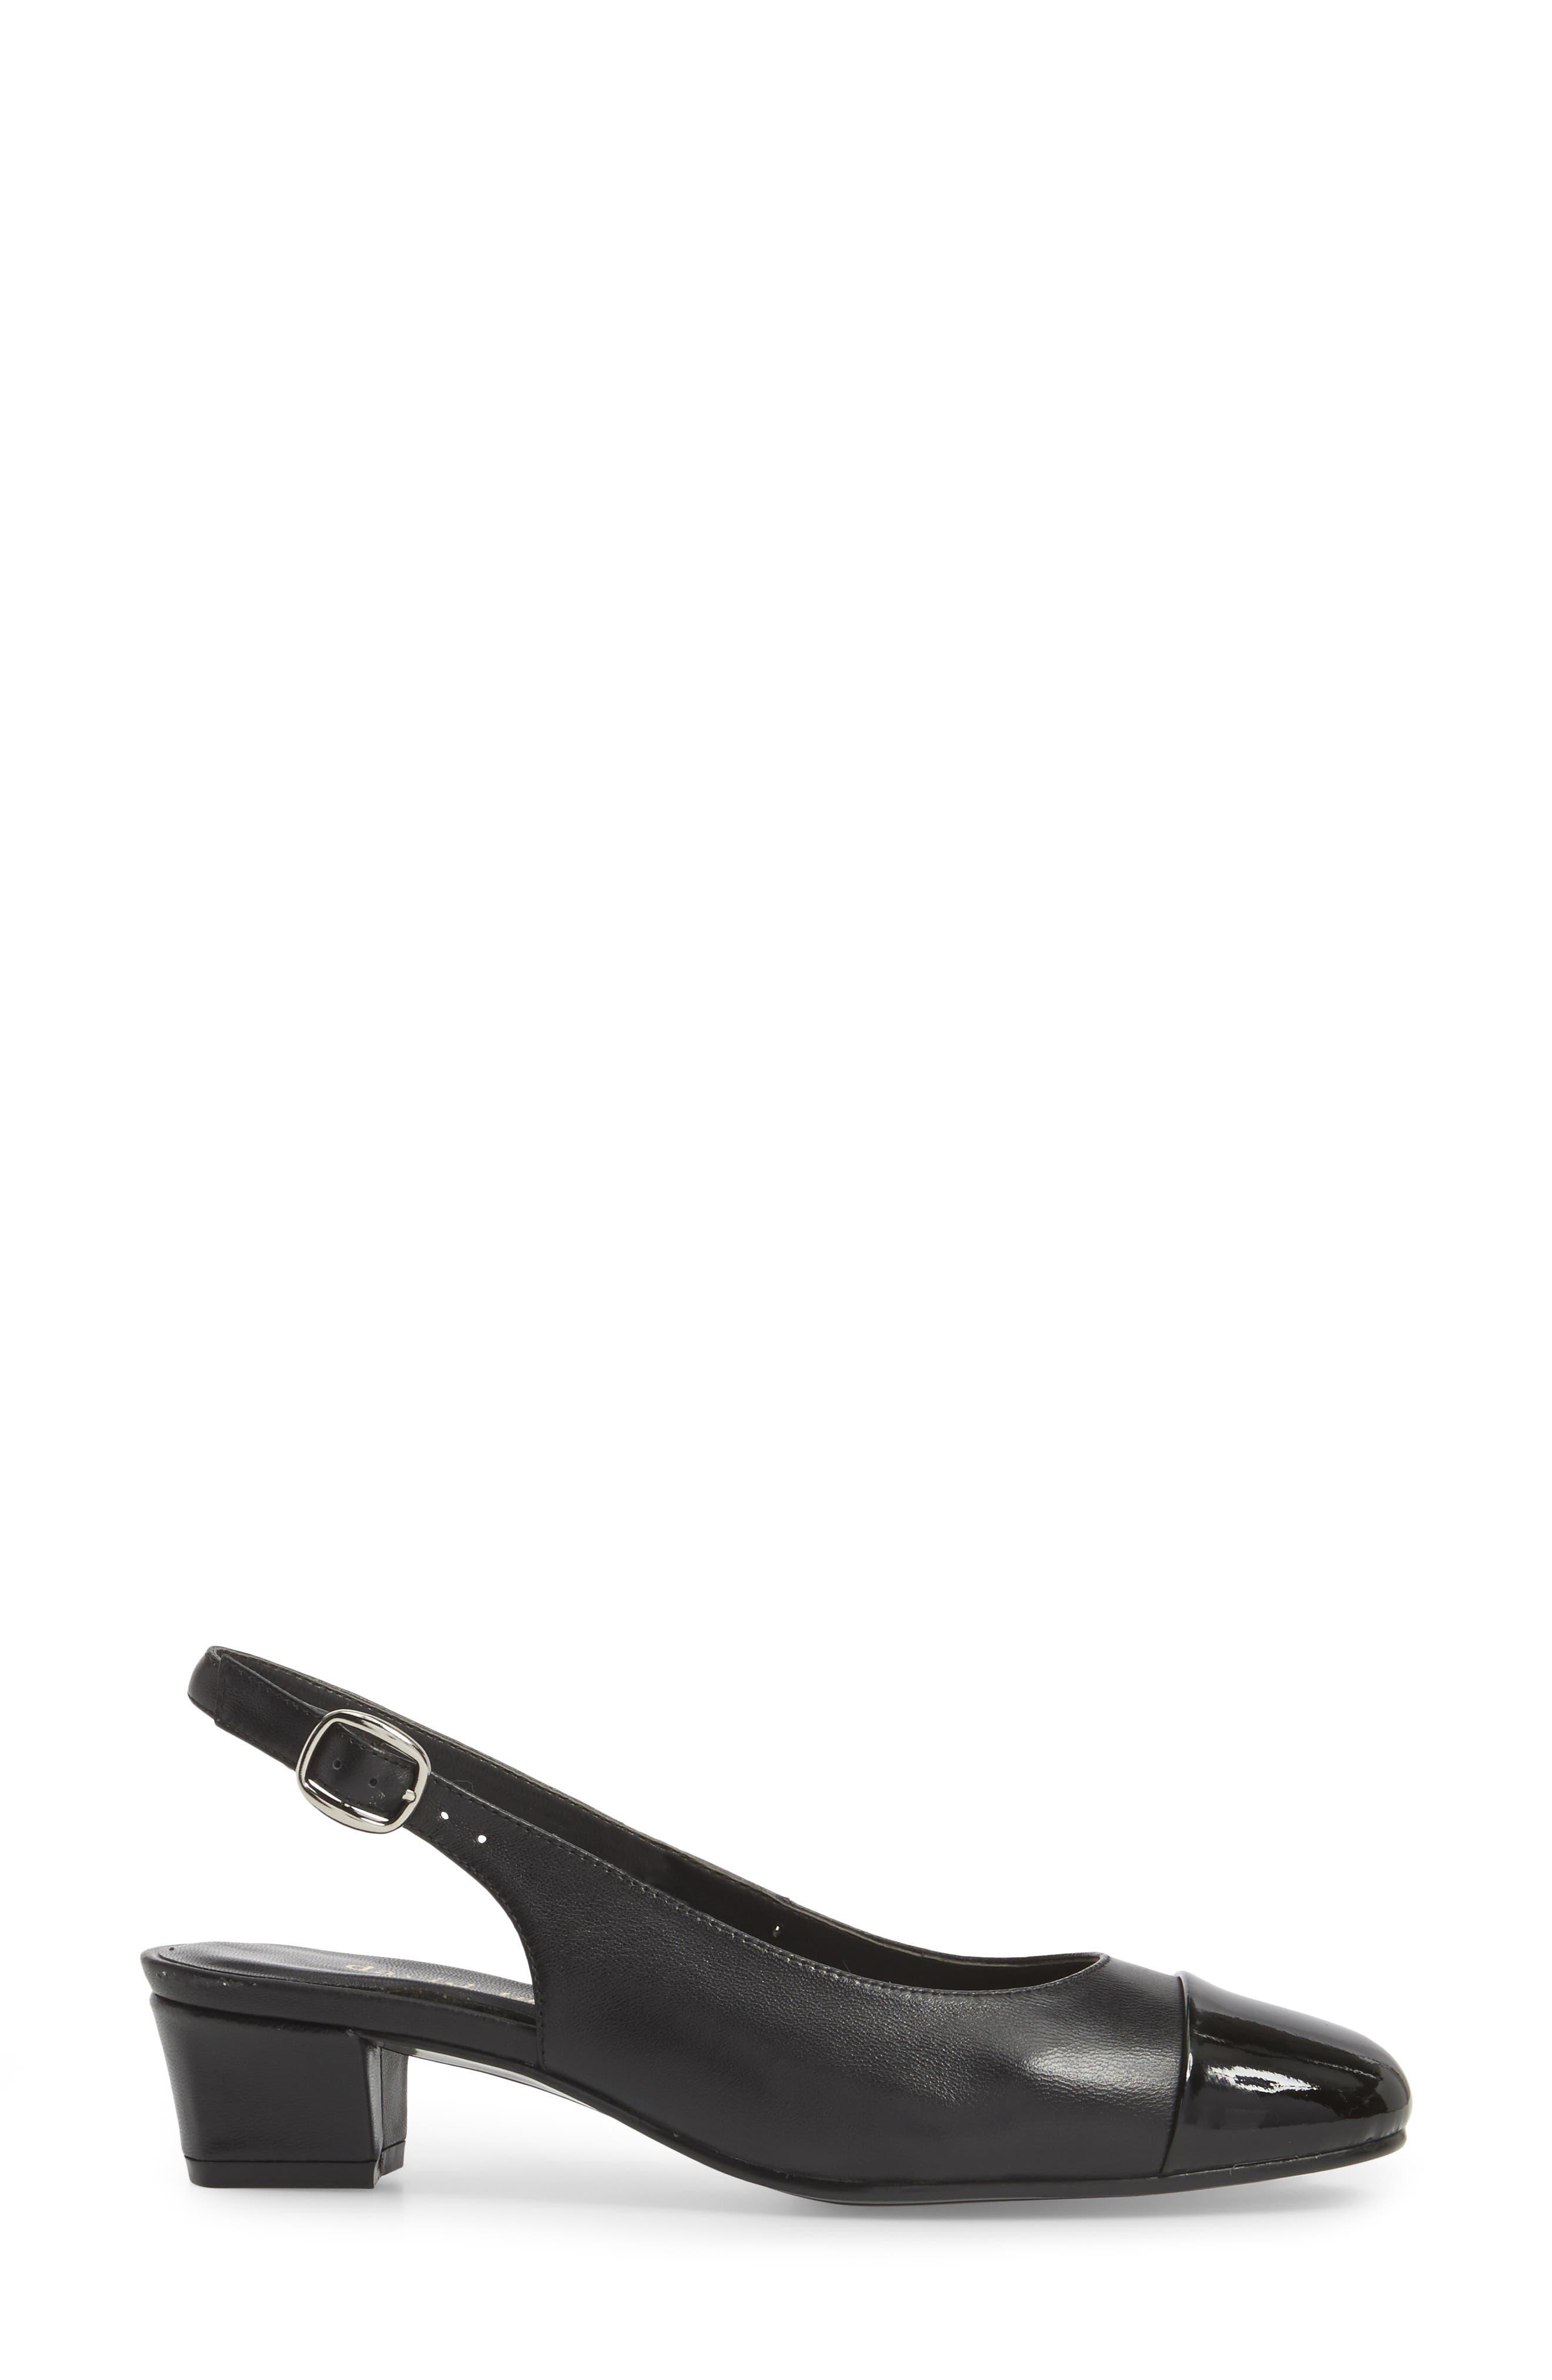 Glorious Slingback Pump,                             Alternate thumbnail 3, color,                             Black Leather